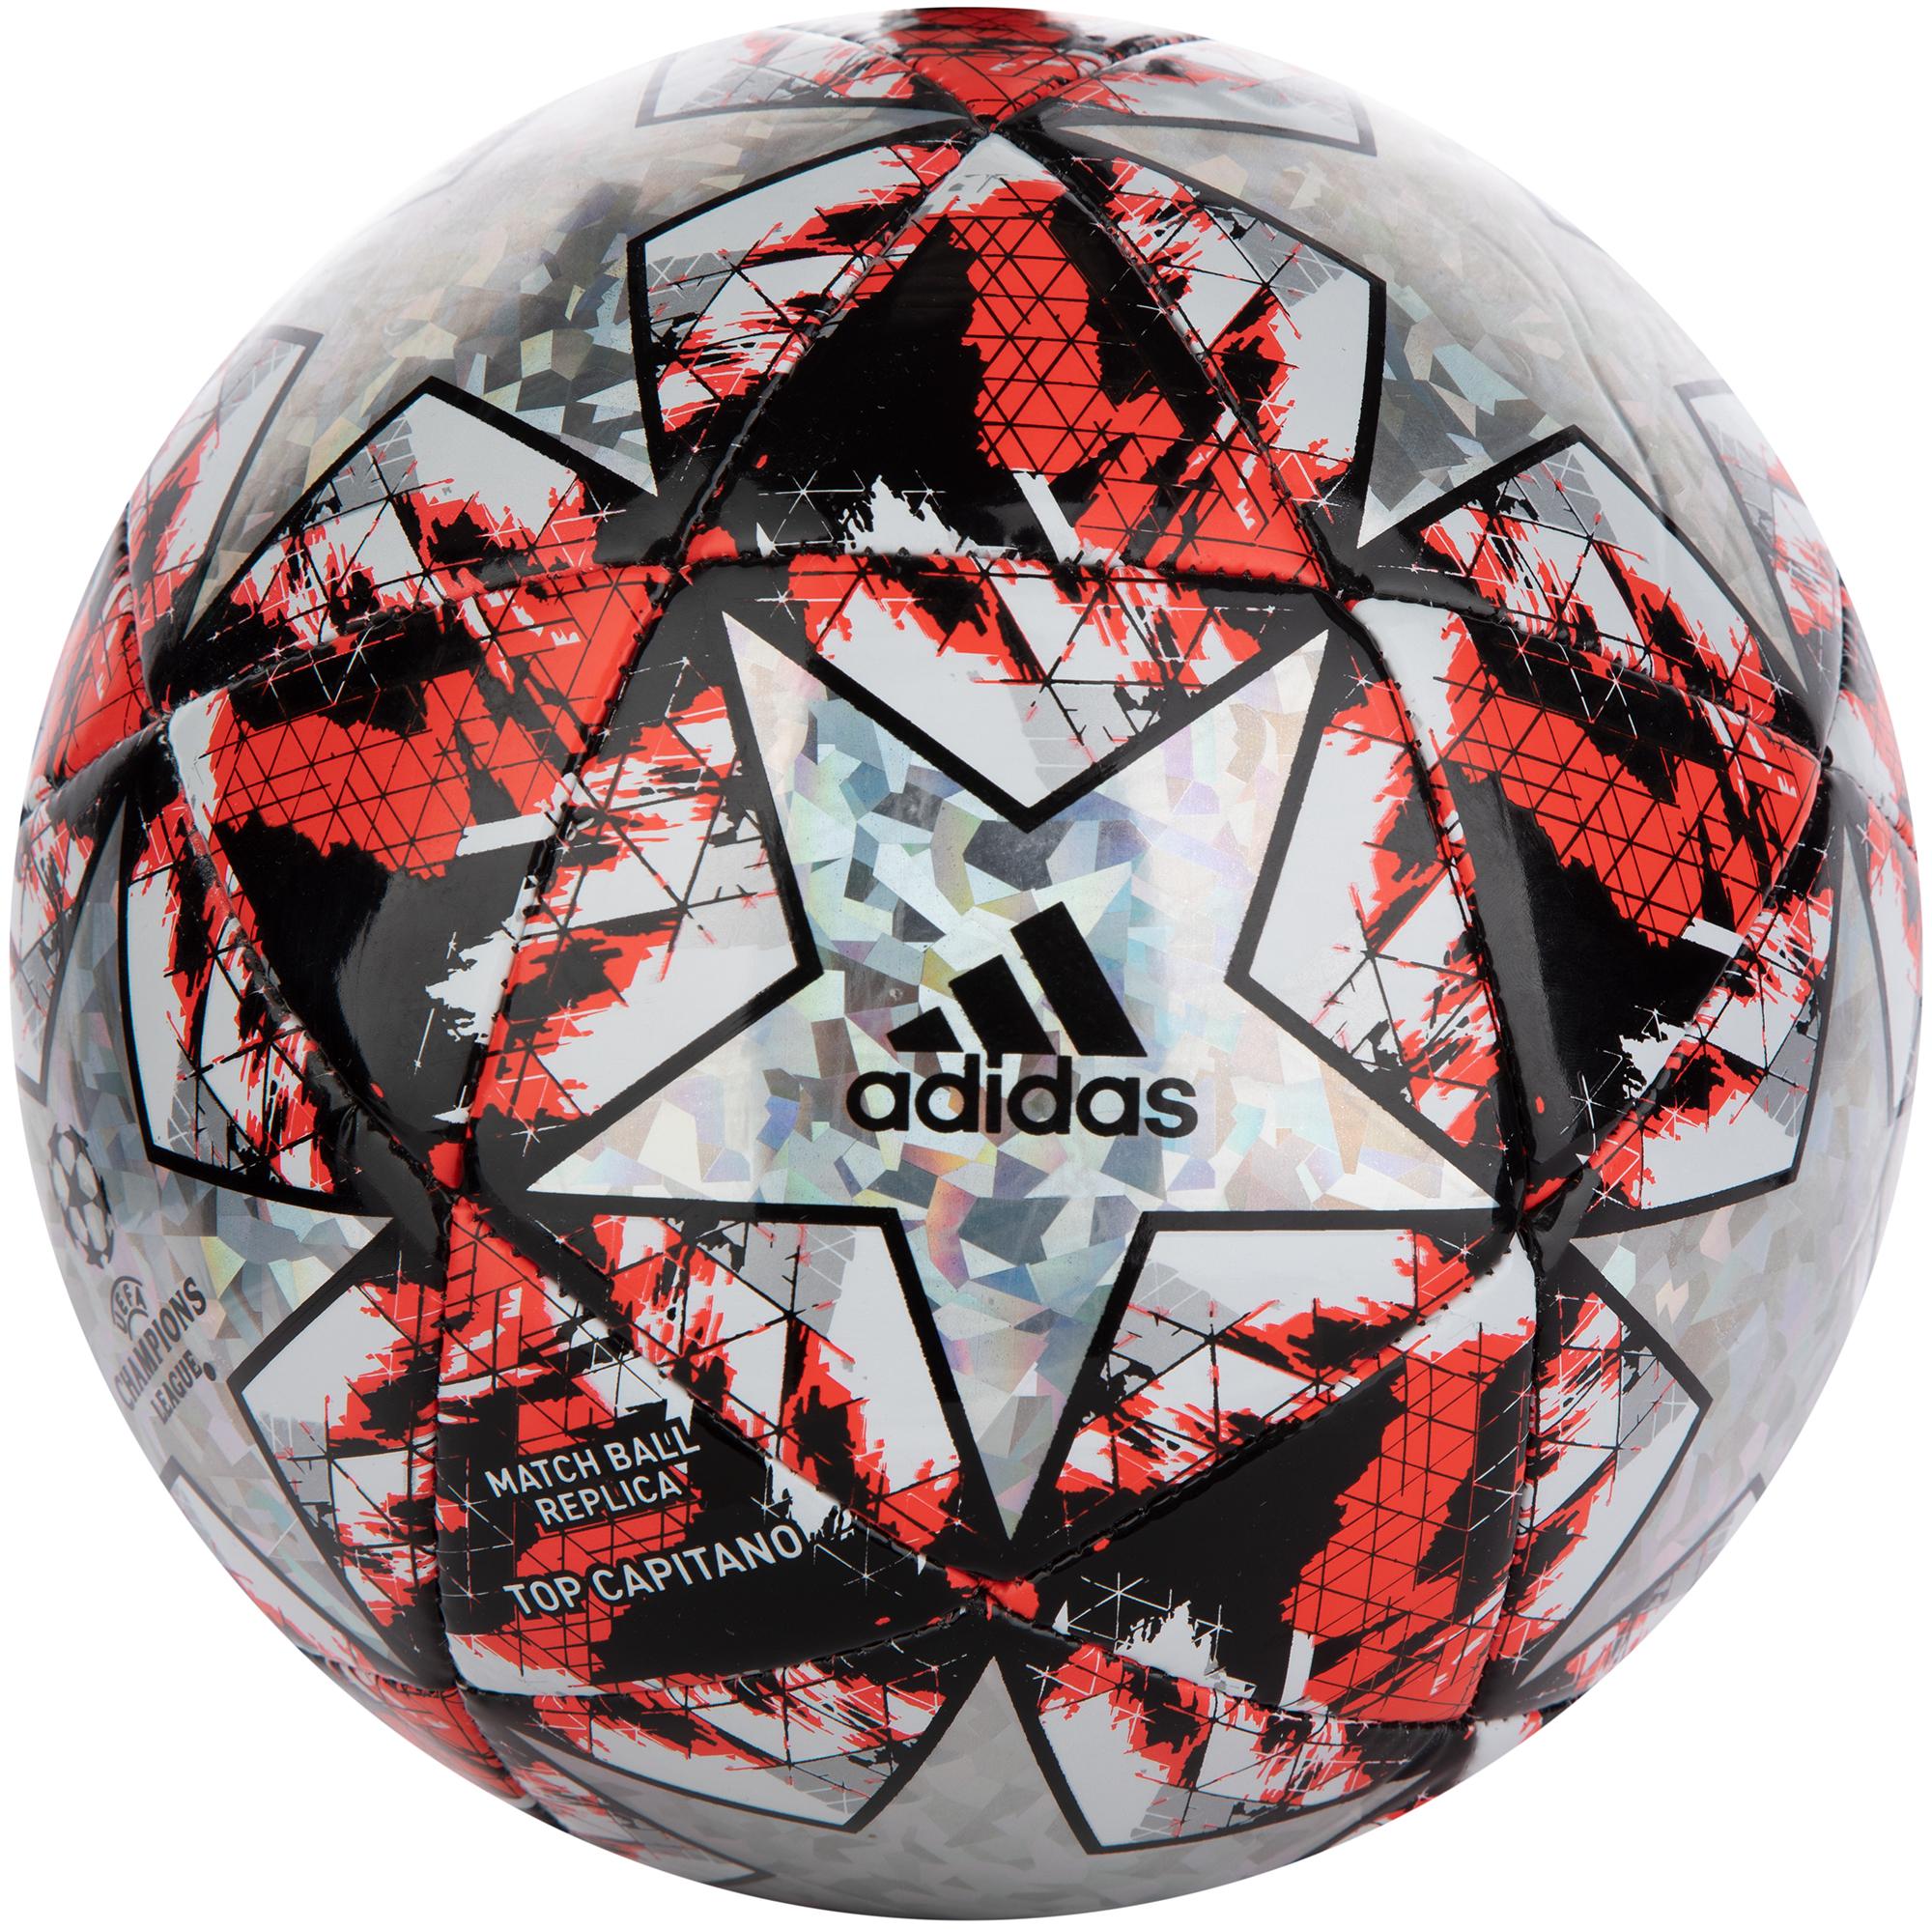 Adidas Мяч футбольный Finale Top Capitano